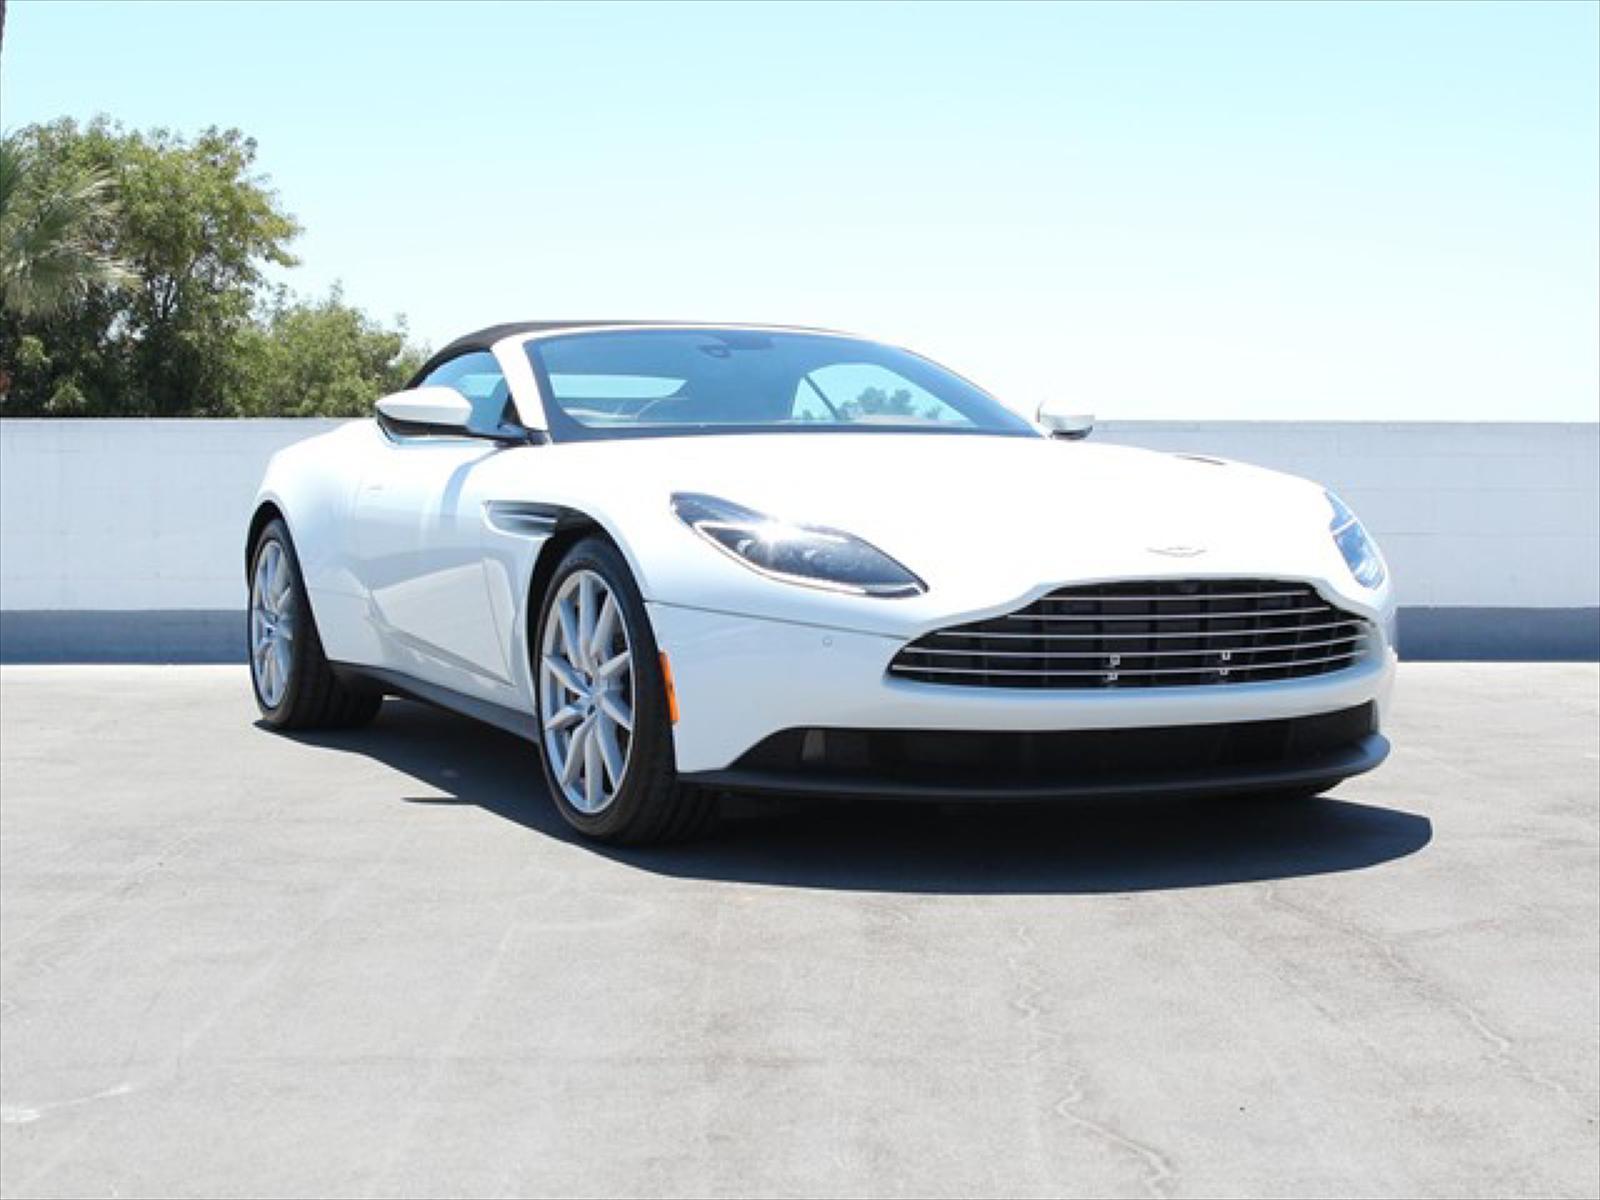 Galpin Aston Martin Los Angeles Aston Martin Special Offers Van Nuys Aston Martin Dealershi